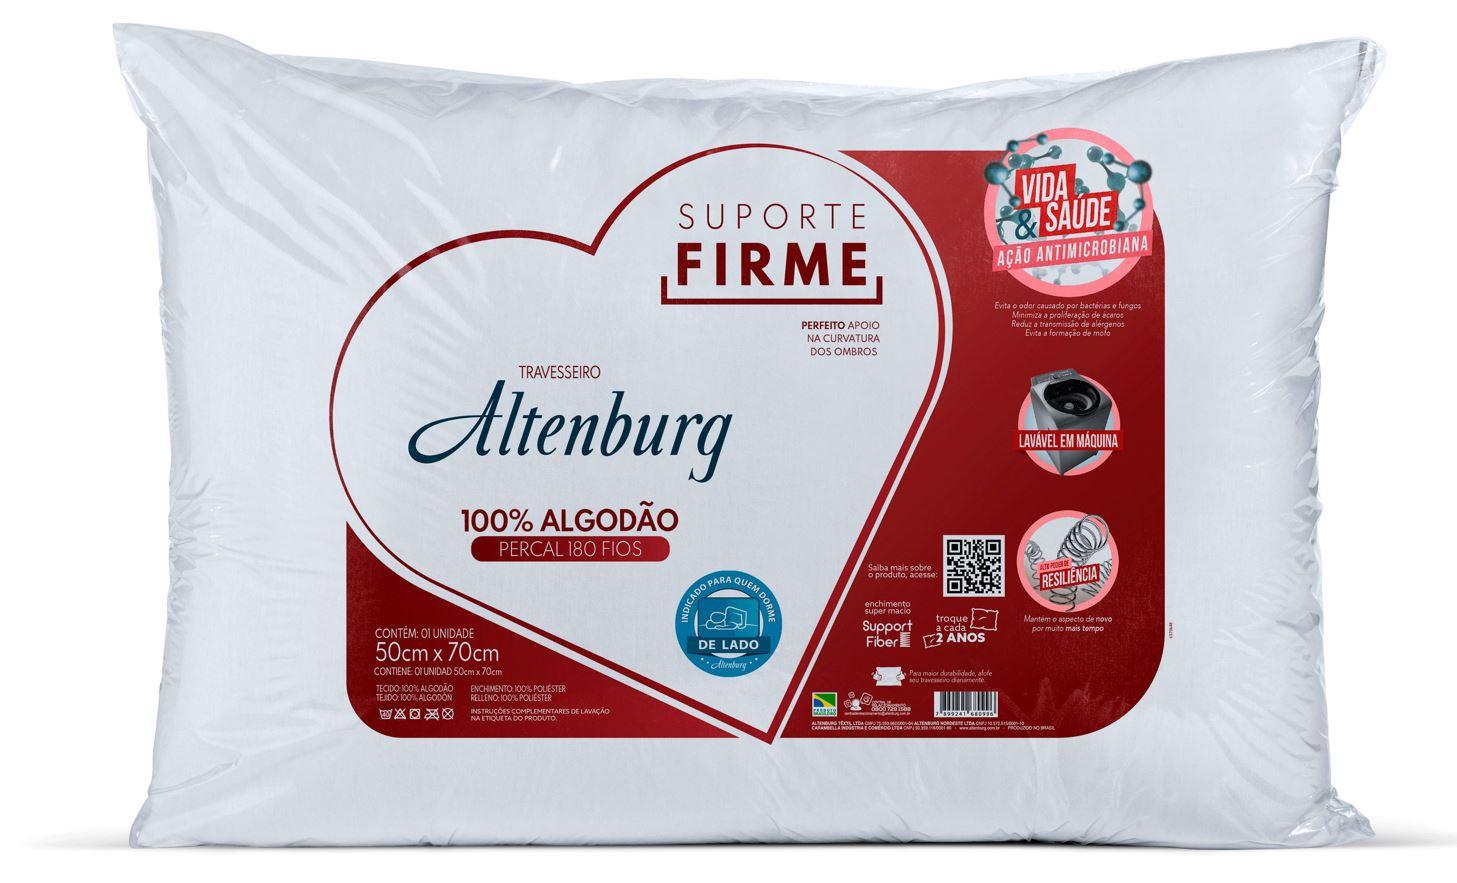 Travesseiro Suporte Firme Altenburg